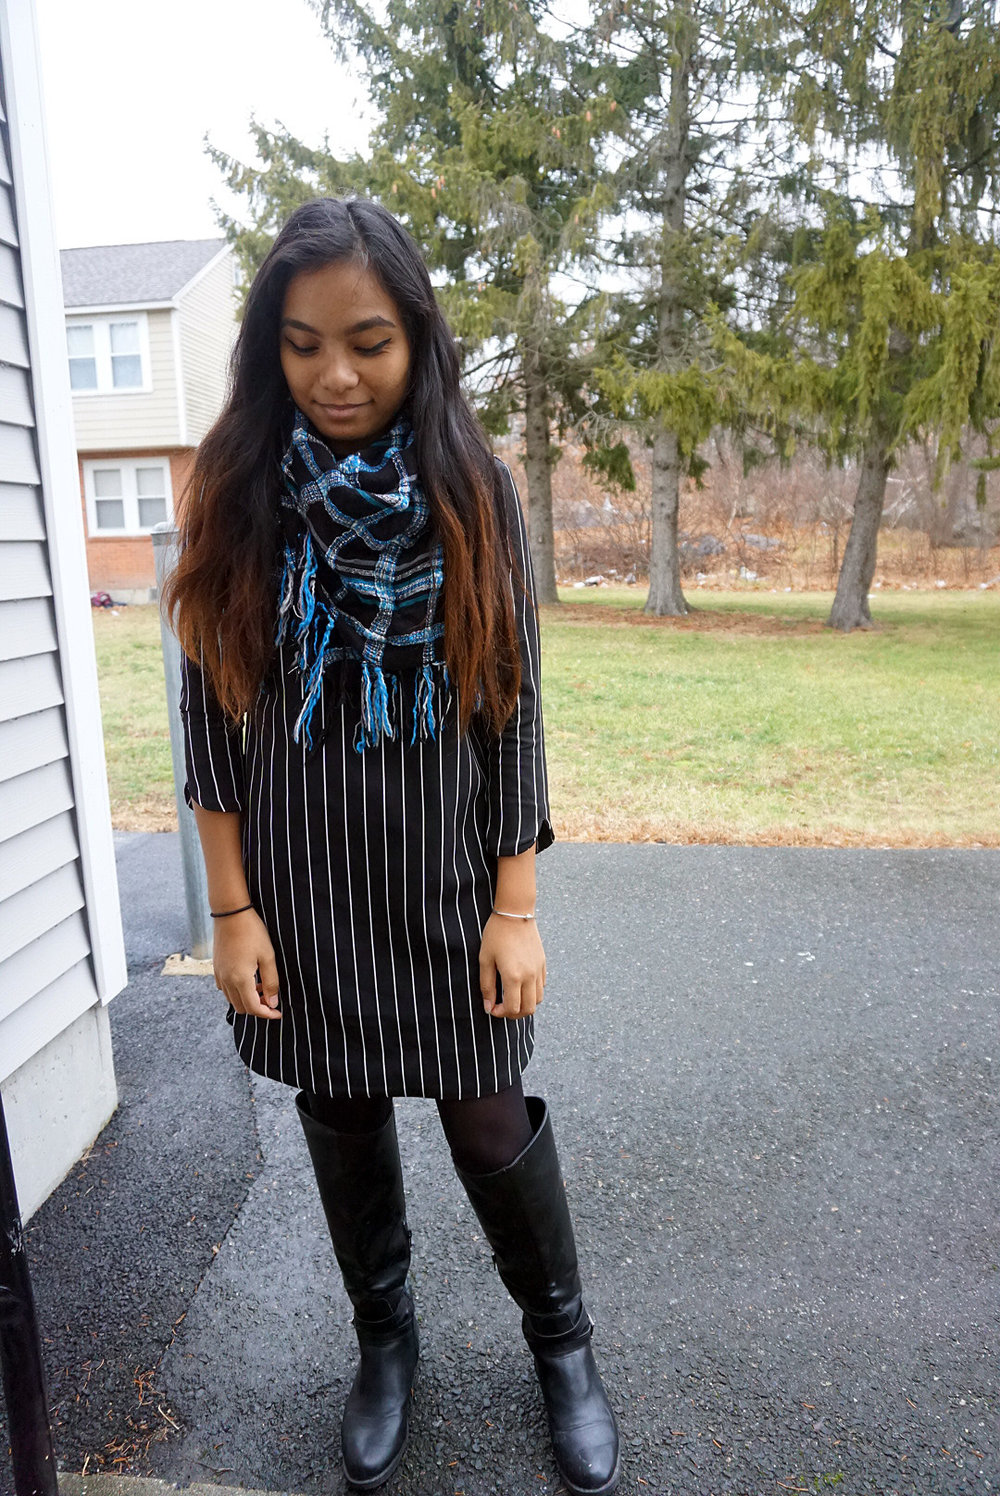 Black-White-Striped-Dress-Blogger-Style-LINDATENCHITRAN-10-1080x1616.jpg